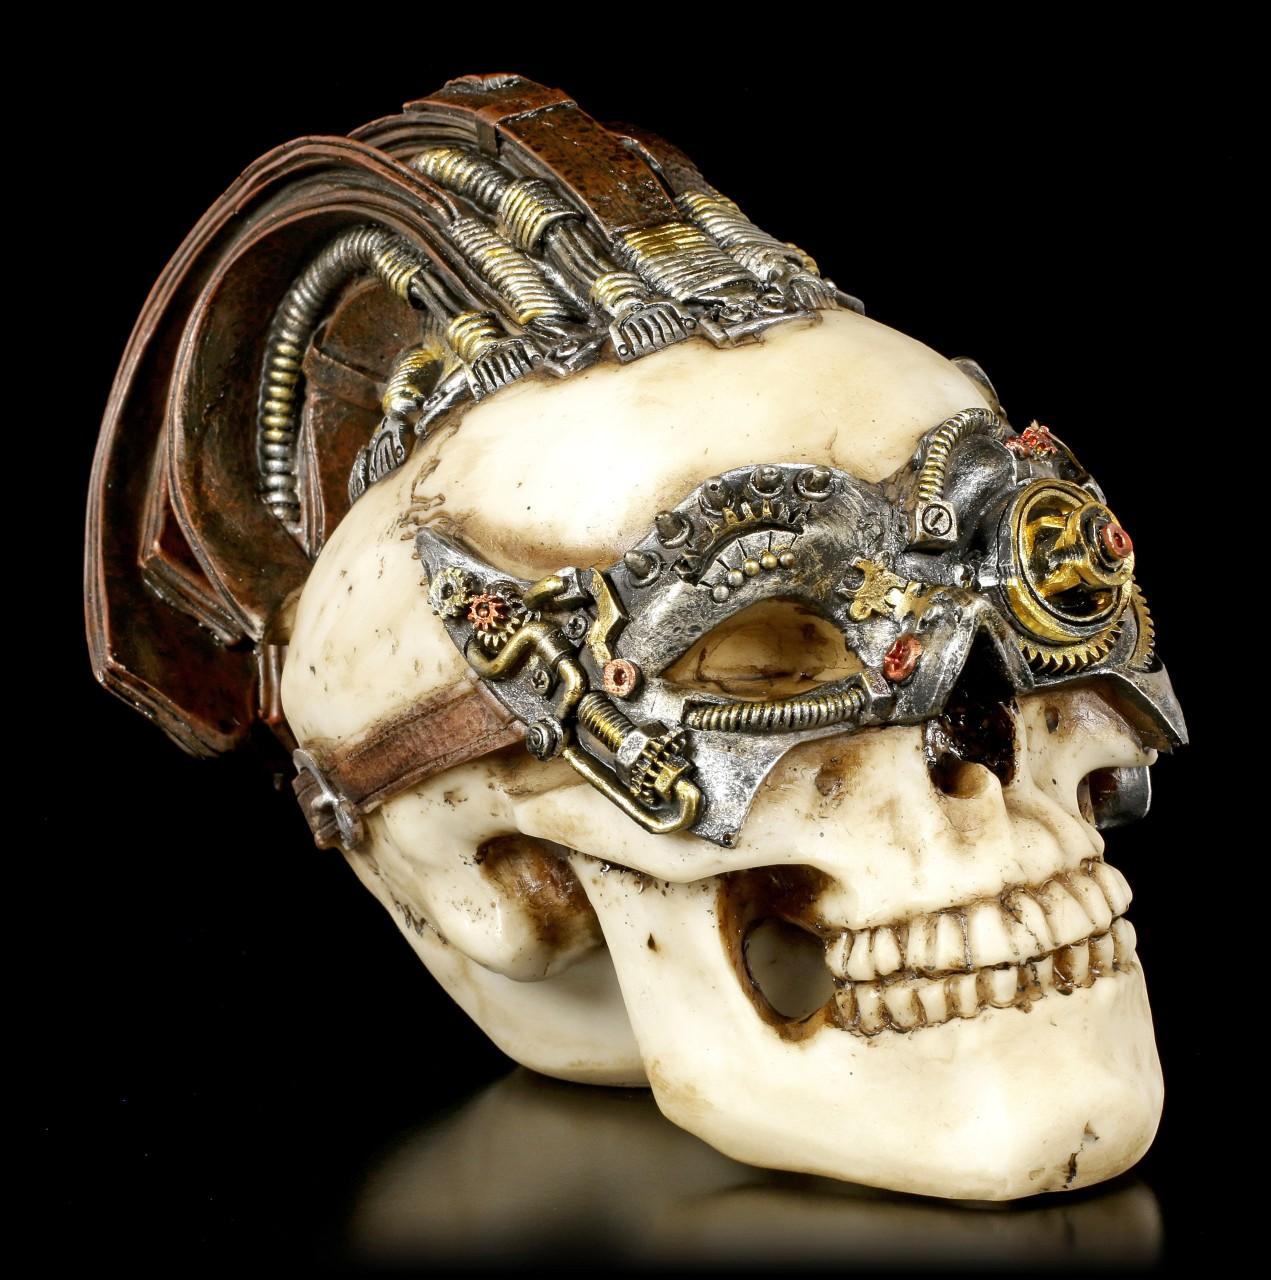 Steampunk Skull - Dreadlock Device small